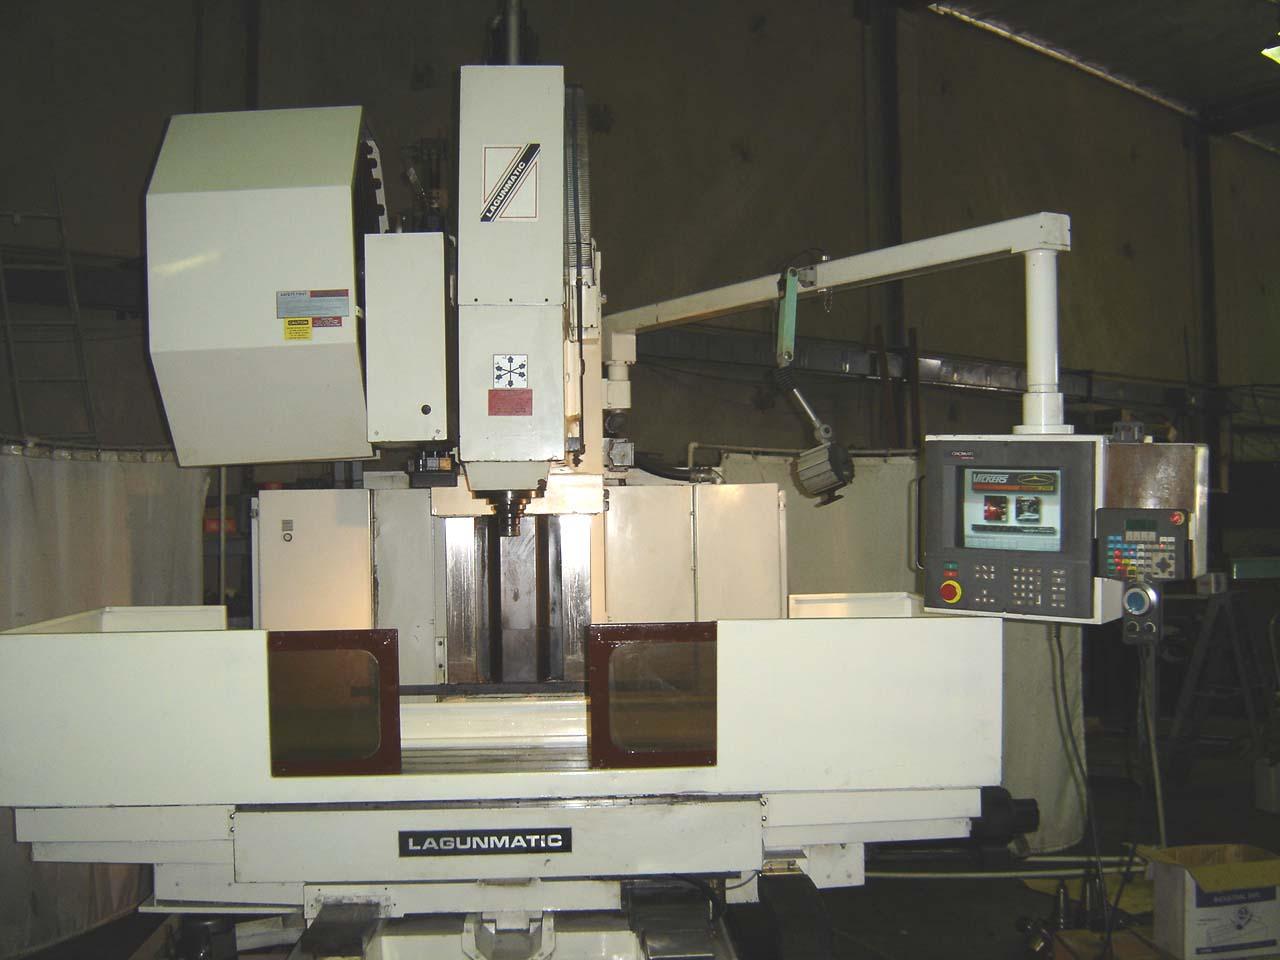 LAGUN47x24x27, ACRAMATIC A2100 CNC CTRL, BT-50 TAPER, 14 TOOLS, RIGID TAPPING